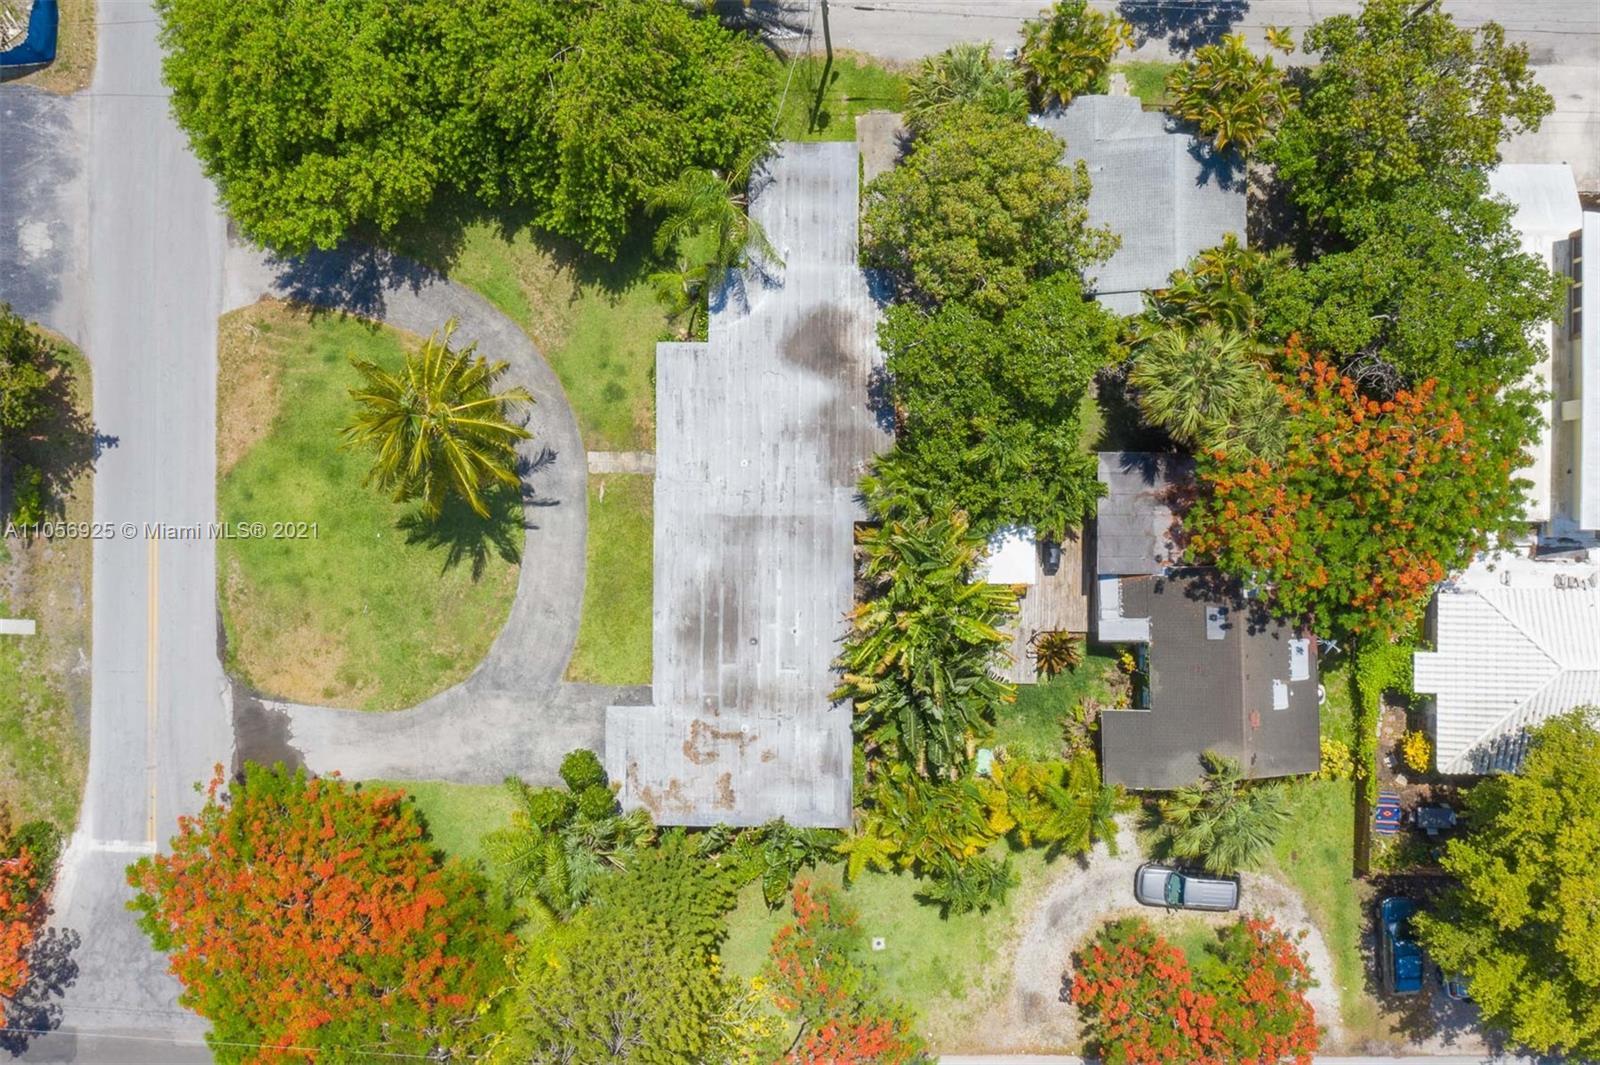 Victoria Park - 740 NE 15th Ave, Fort Lauderdale, FL 33304